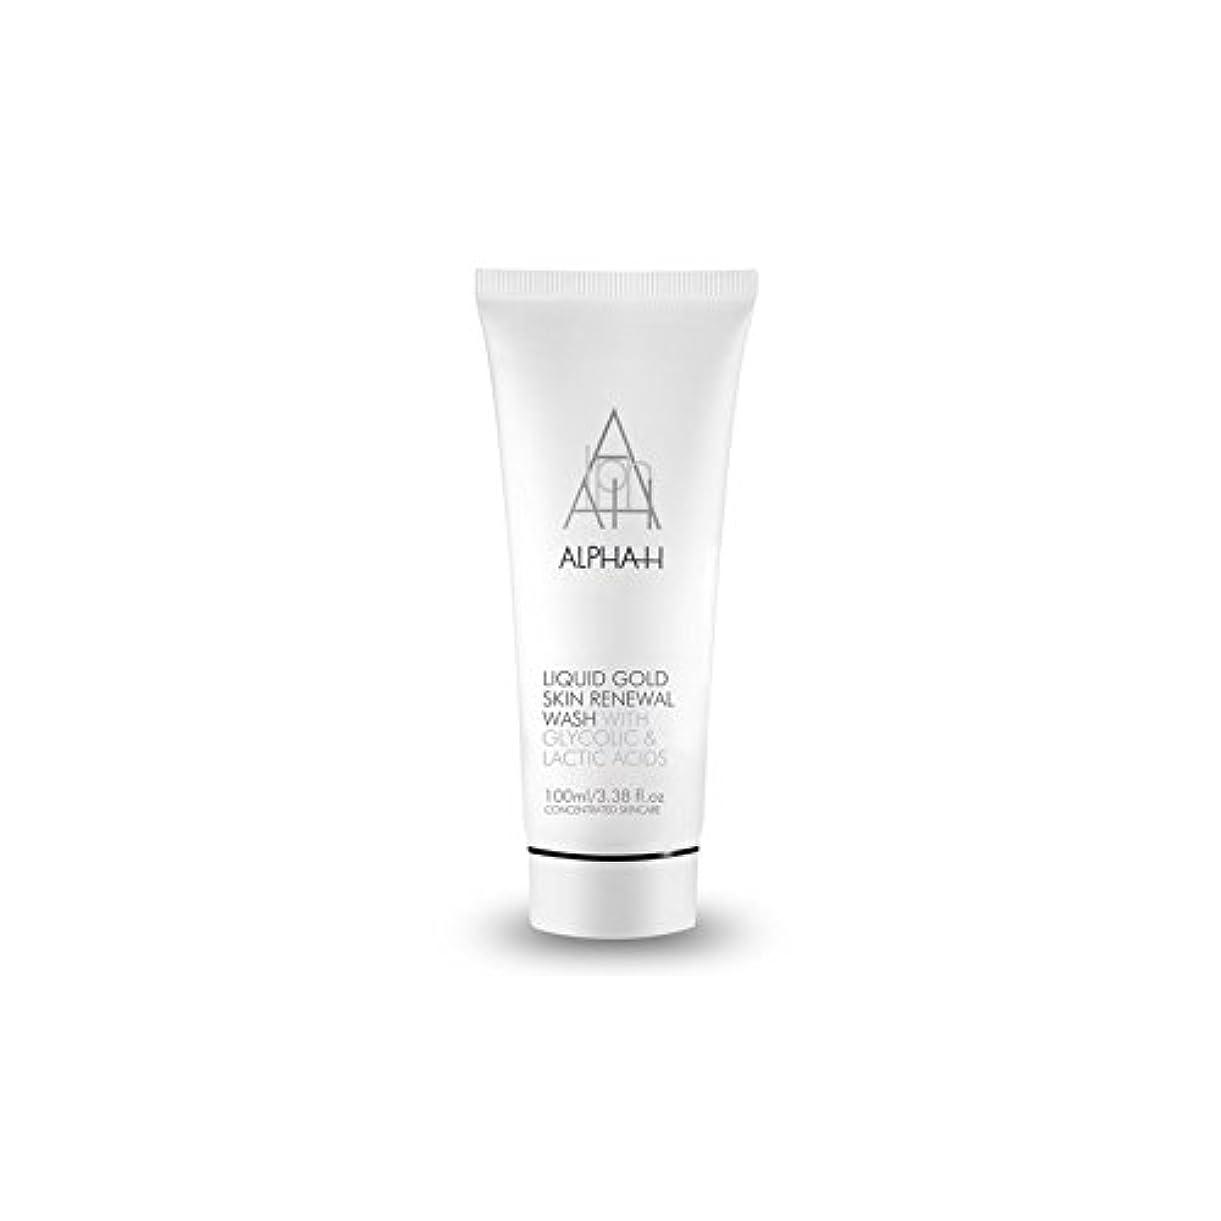 Alpha H Gold Skin Renewal Wash (100ml) (Pack of 6) - アルファのゴールドスキンリニューアルウォッシュ(100ミリリットル) x6 [並行輸入品]